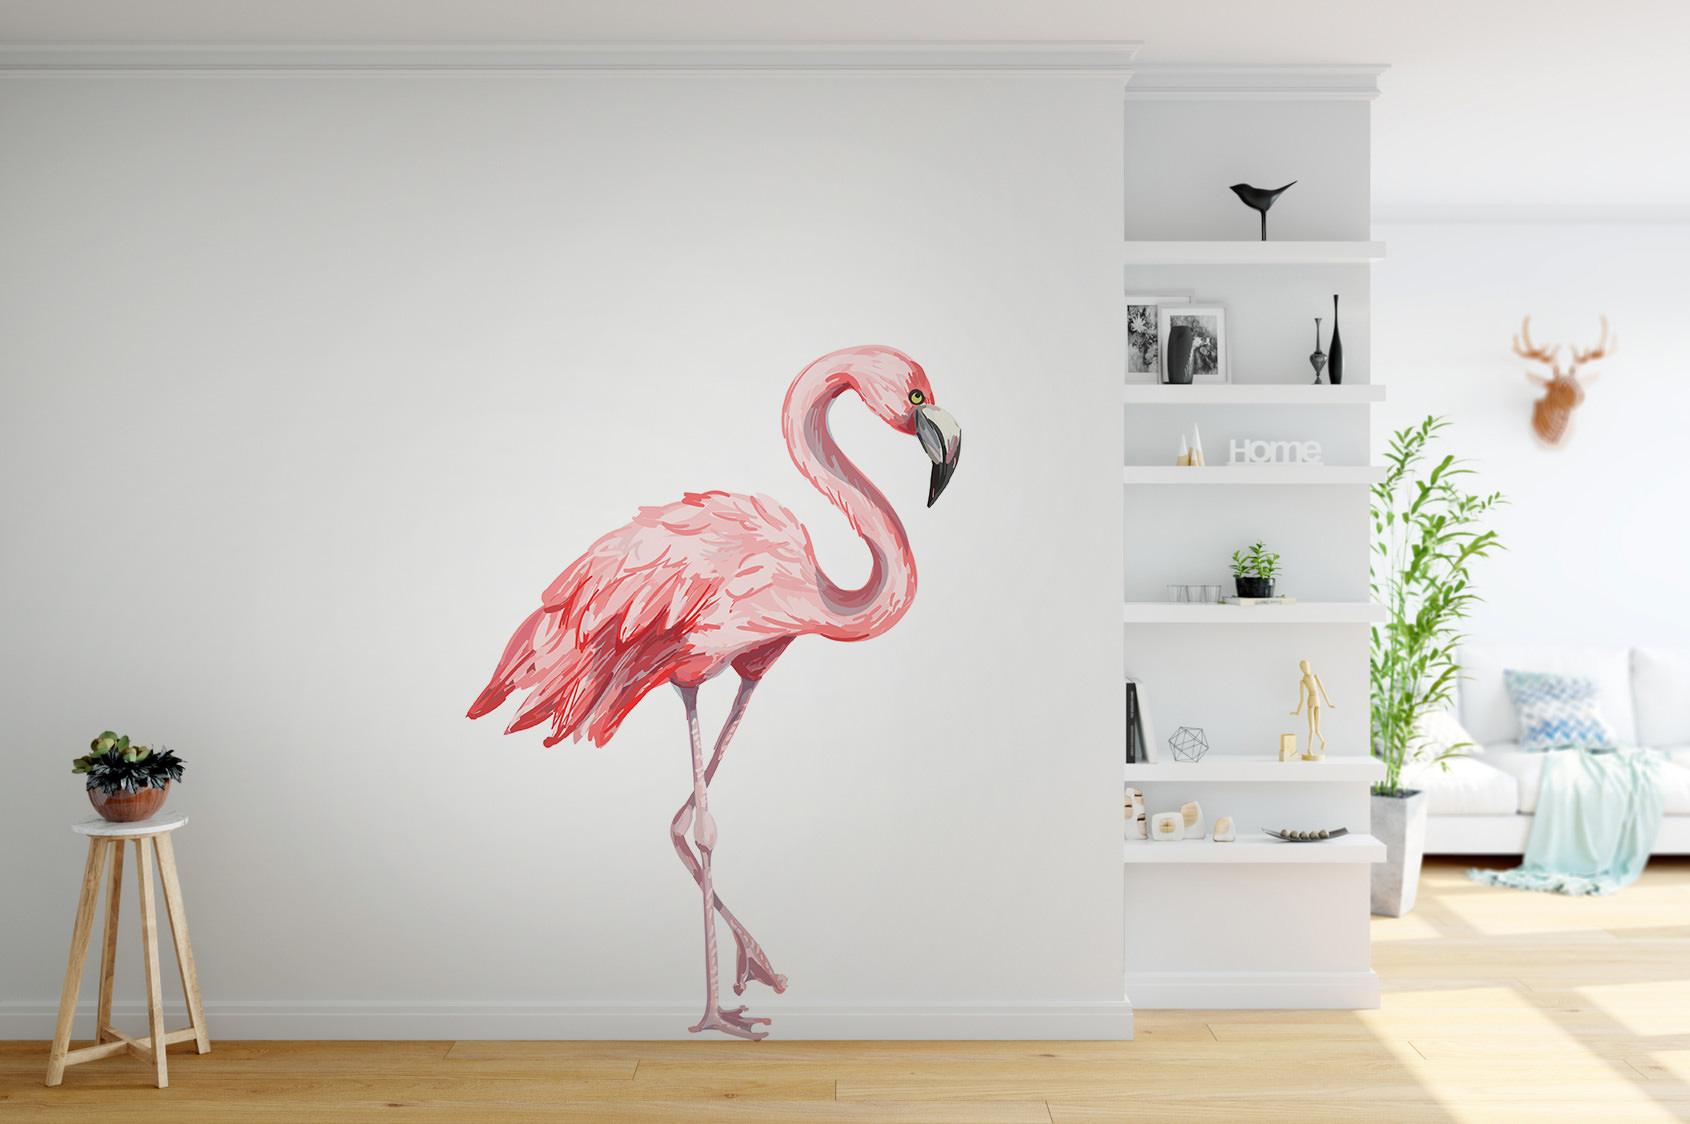 Naklejka - Flaming - fototapeta.shop